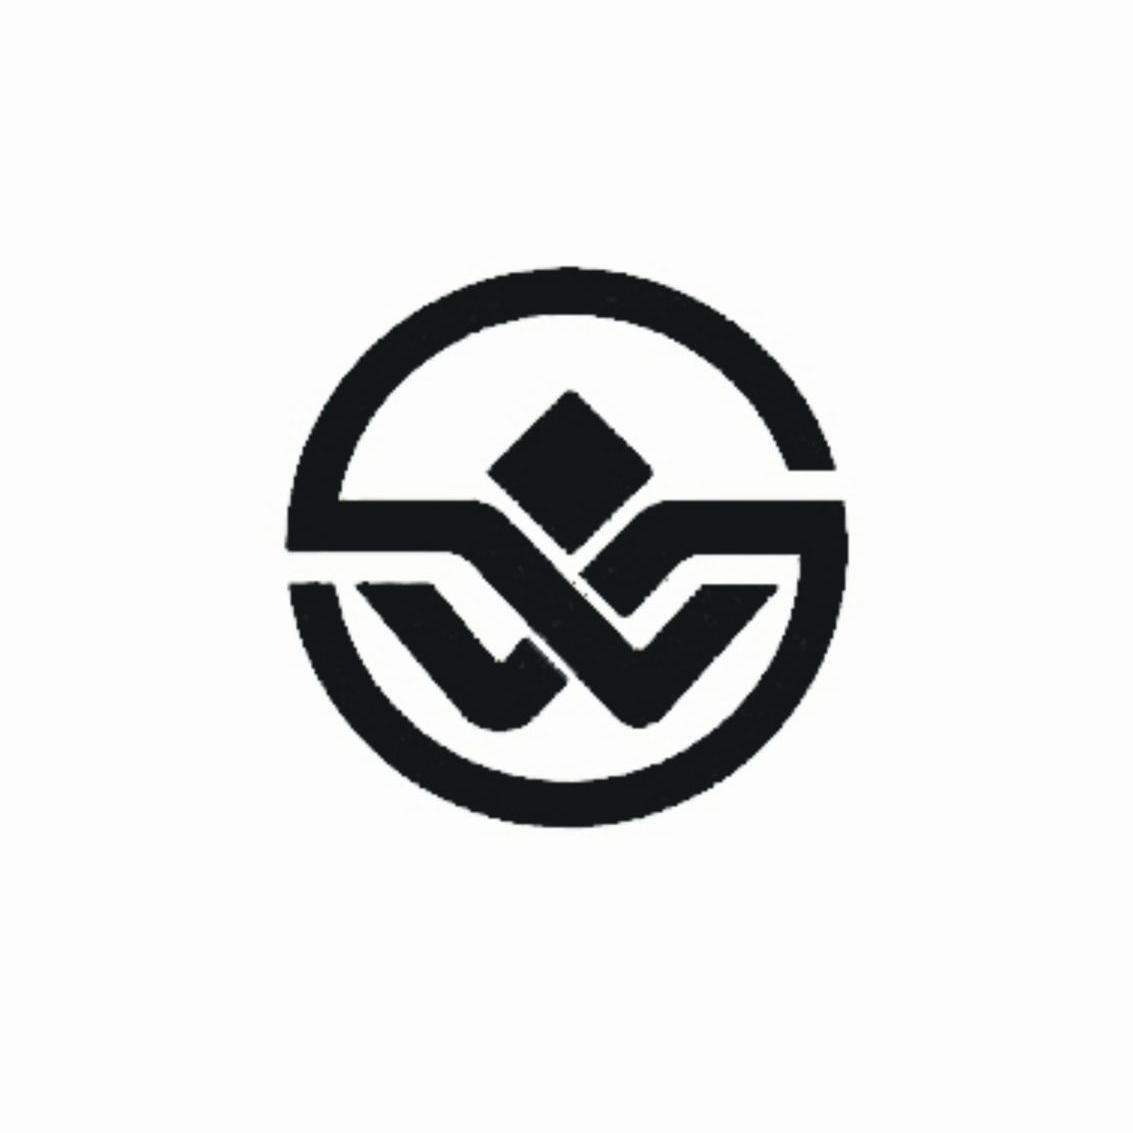 logo logo 标识 标志 设计 矢量 矢量图 素材 图标 1133_1133